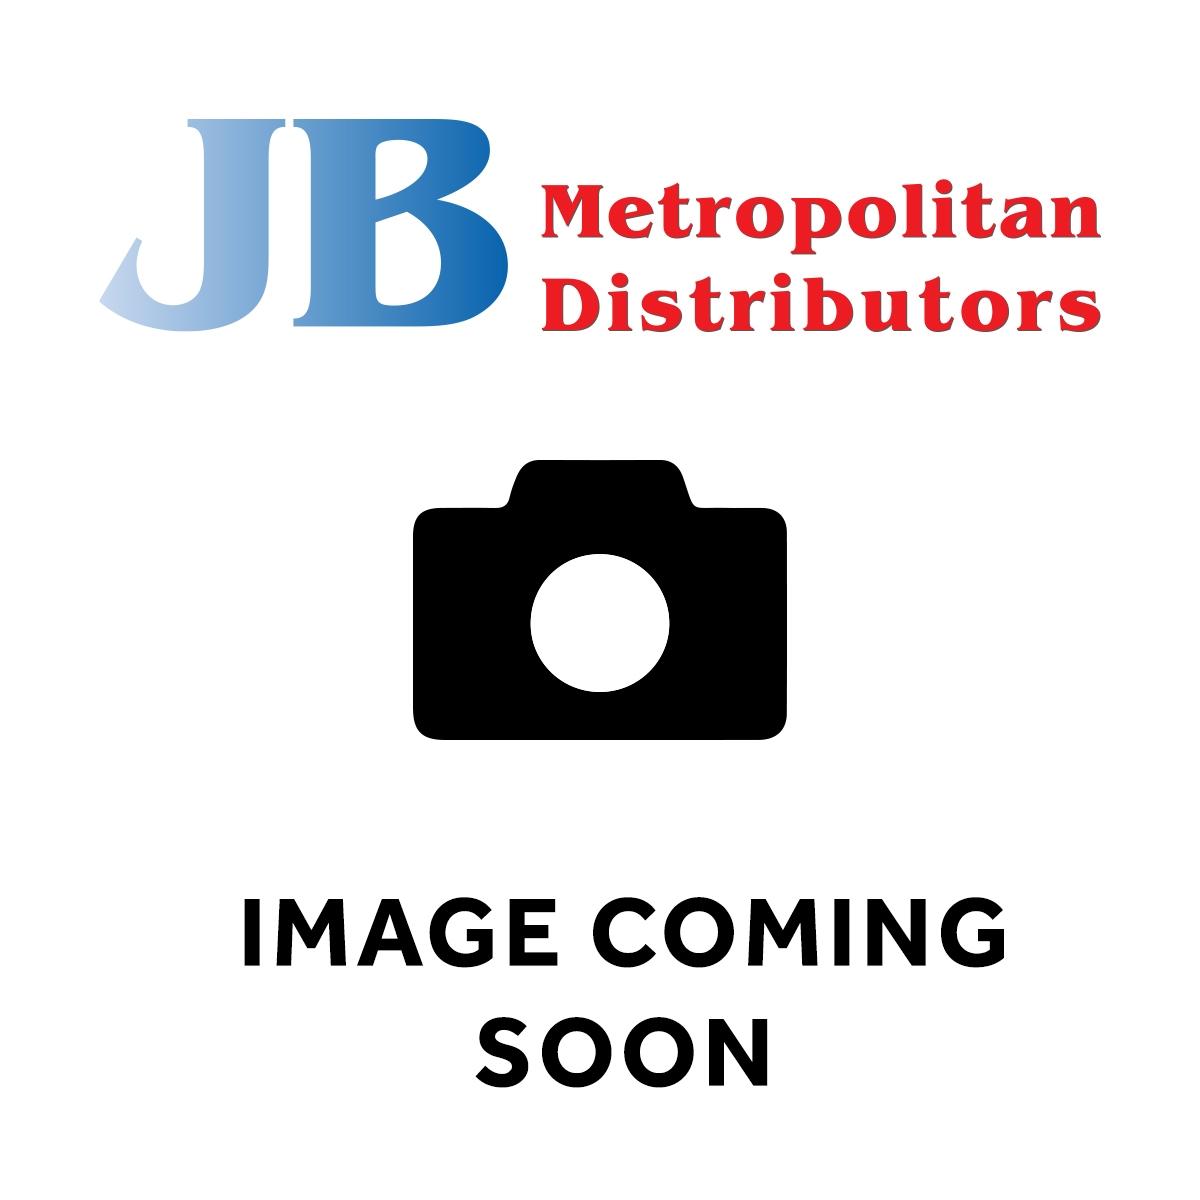 200ML J & J BABY LOTION